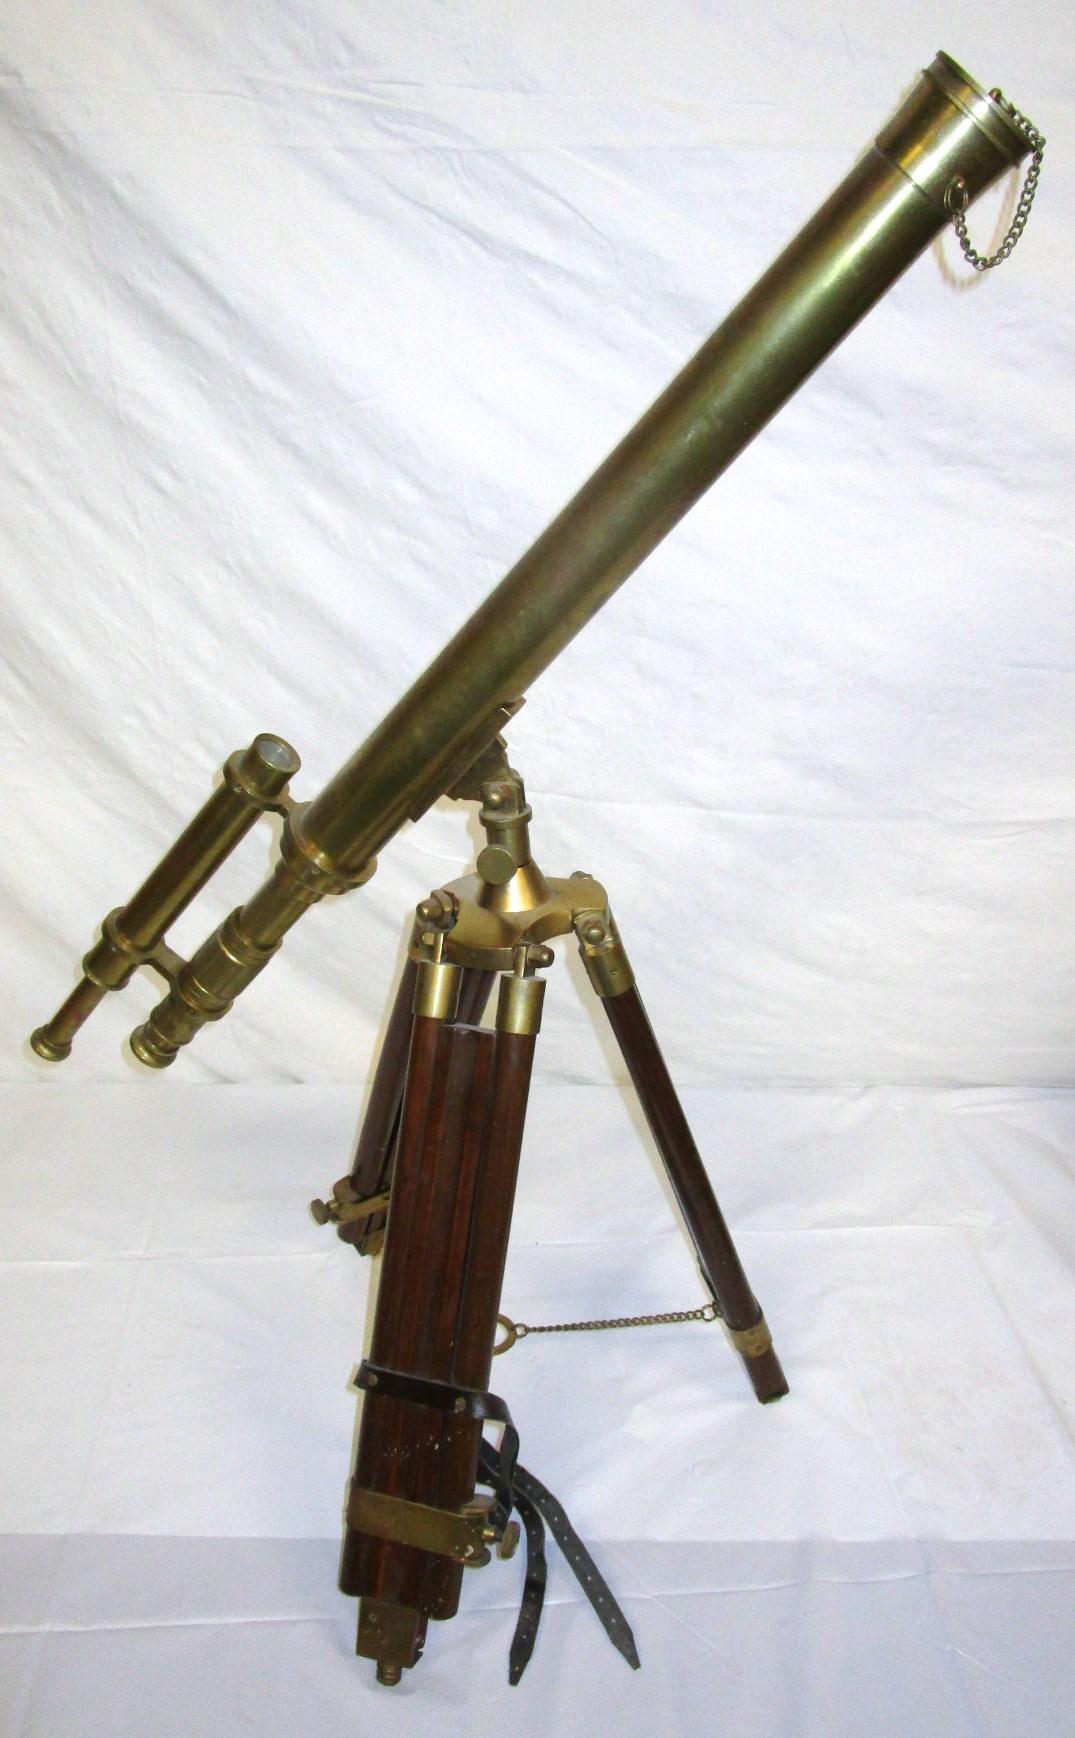 Brass telescope on tripod